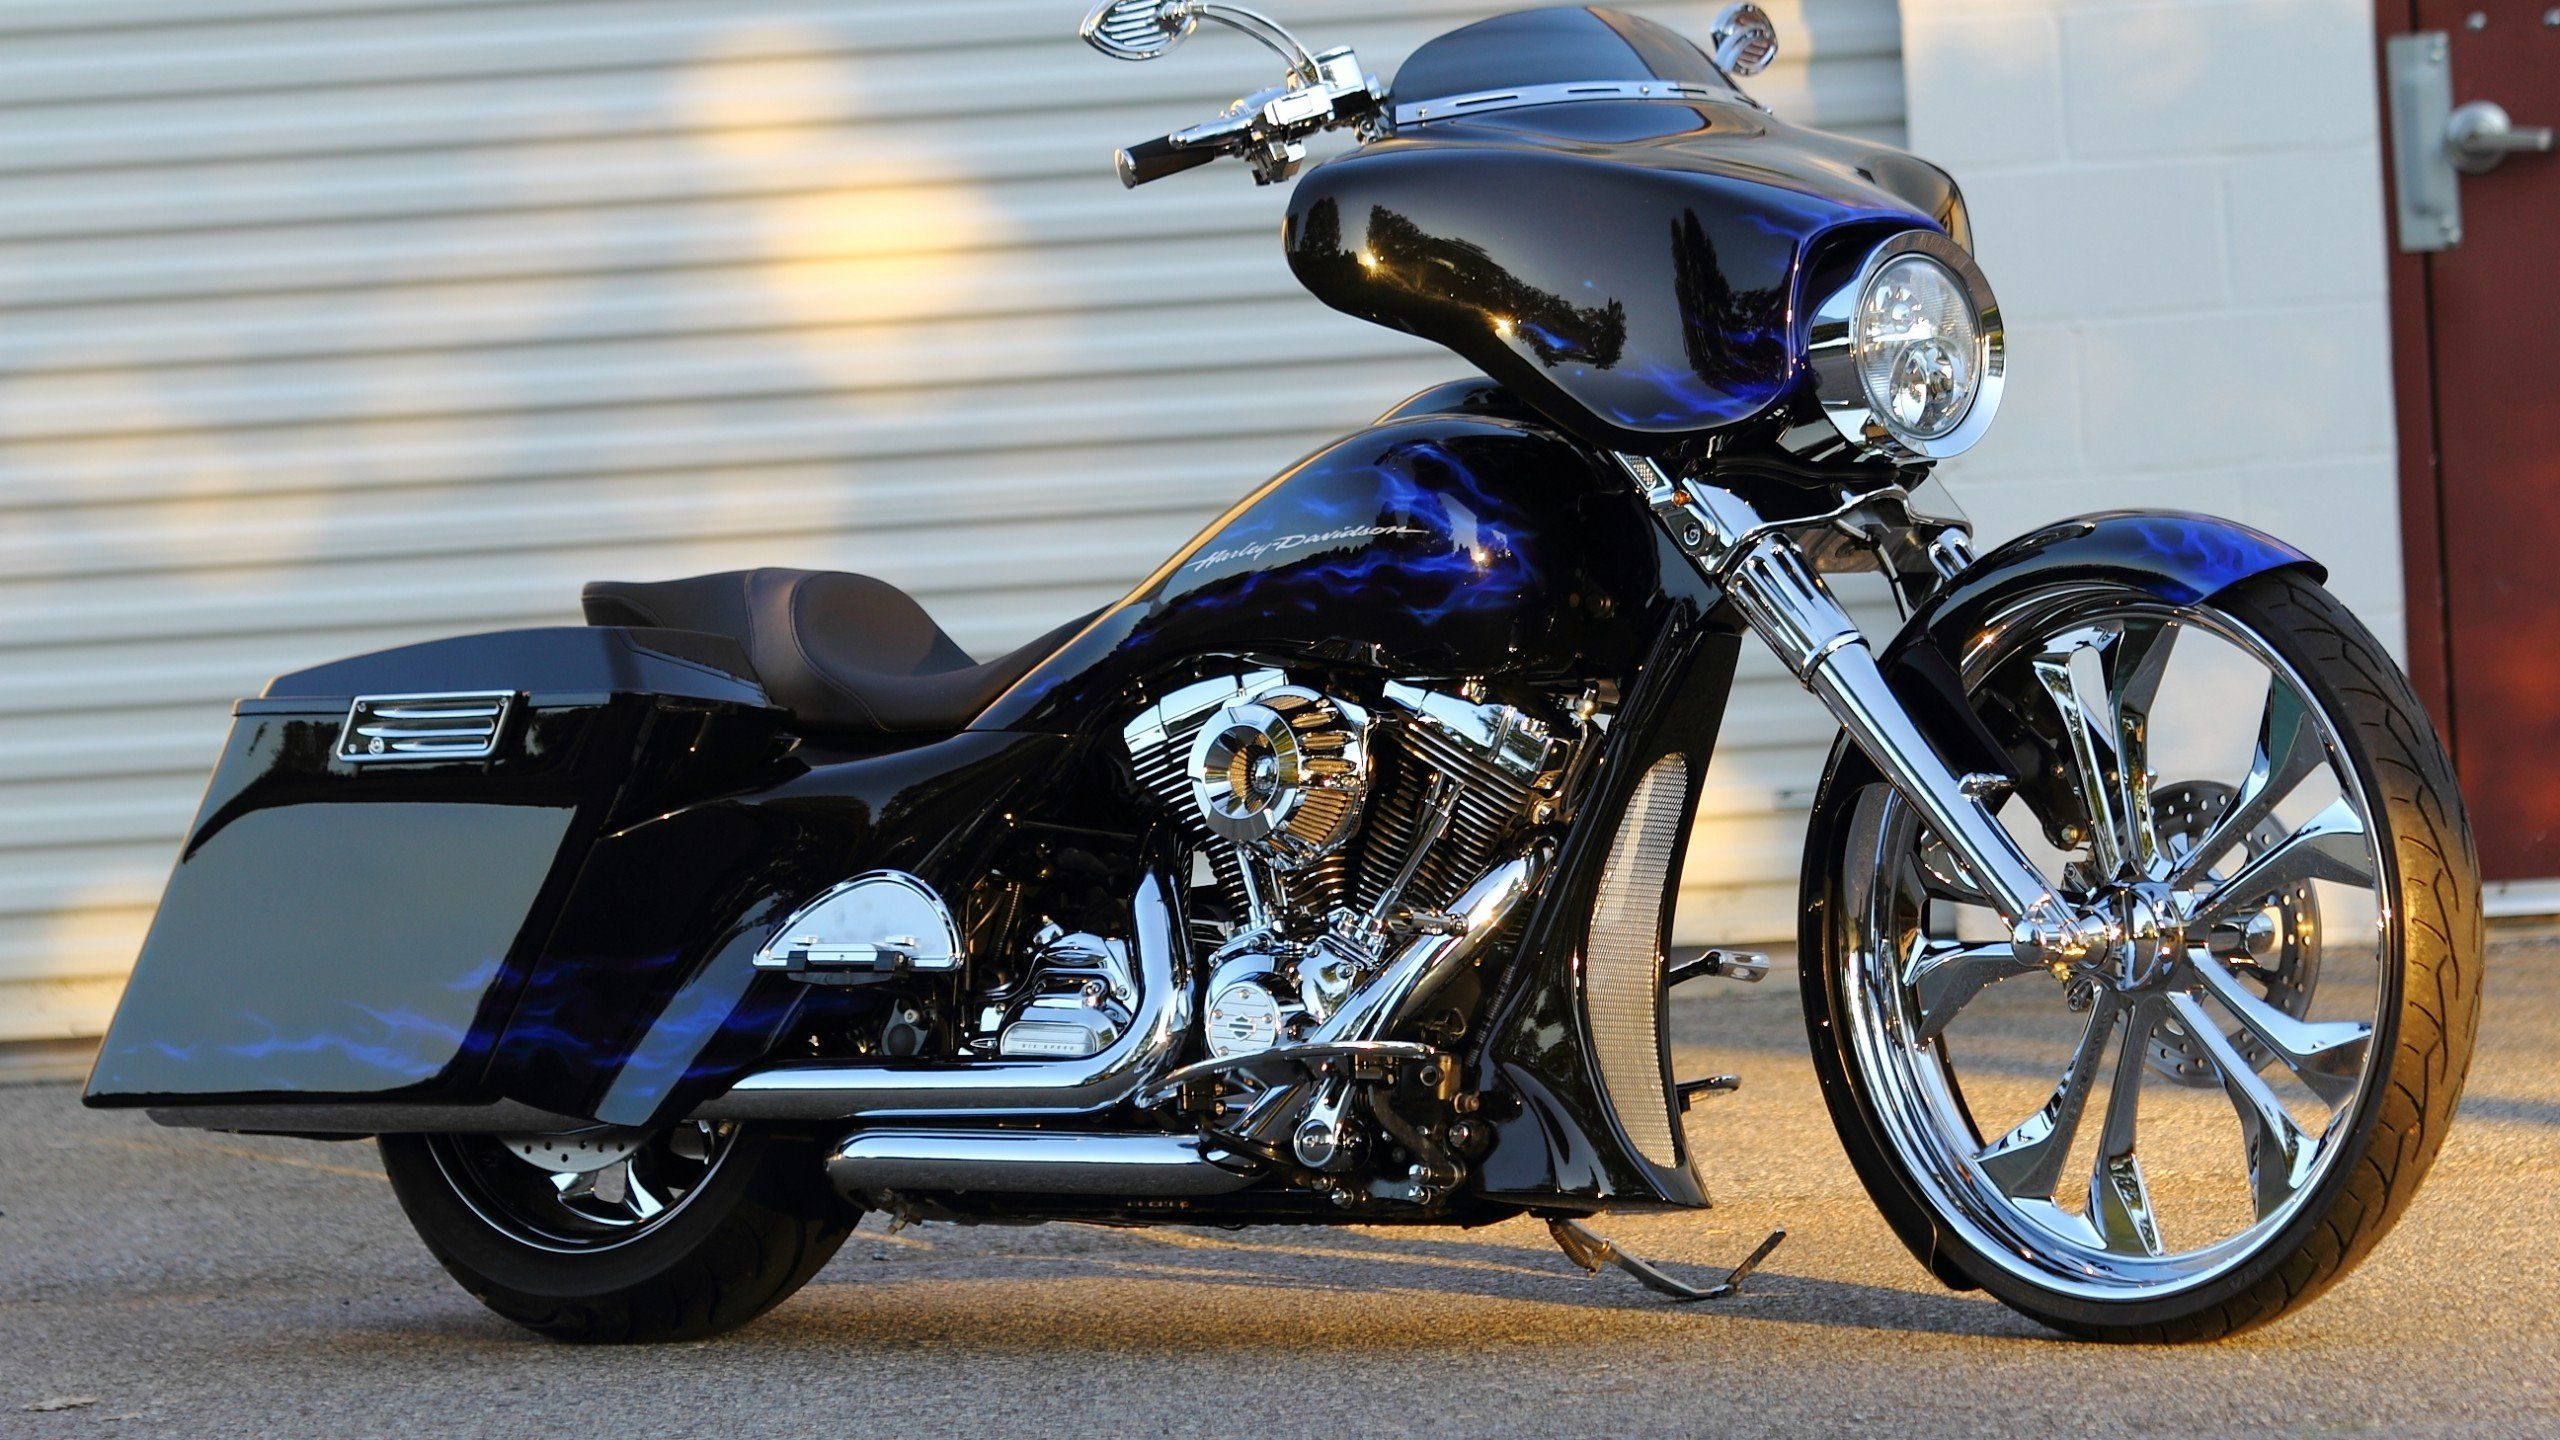 Harley-Davidson Bagger Wallpapers